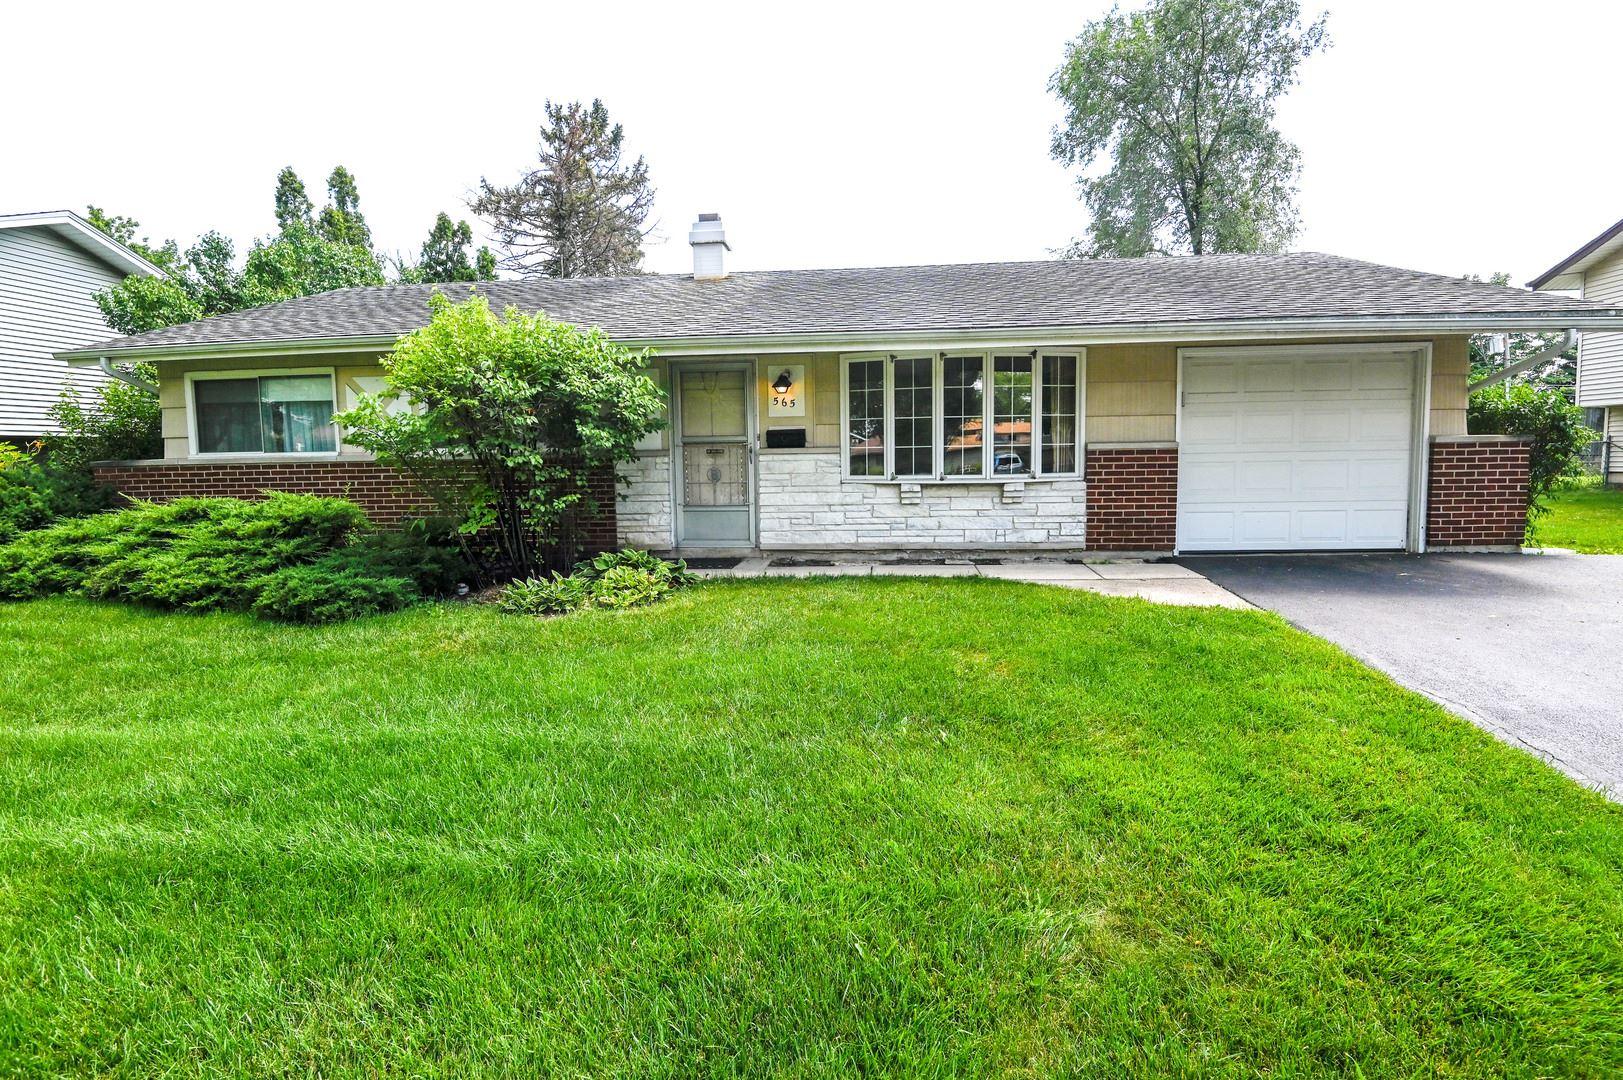 565 Amherst Lane, Hoffman Estates, IL 60169 - #: 11149235